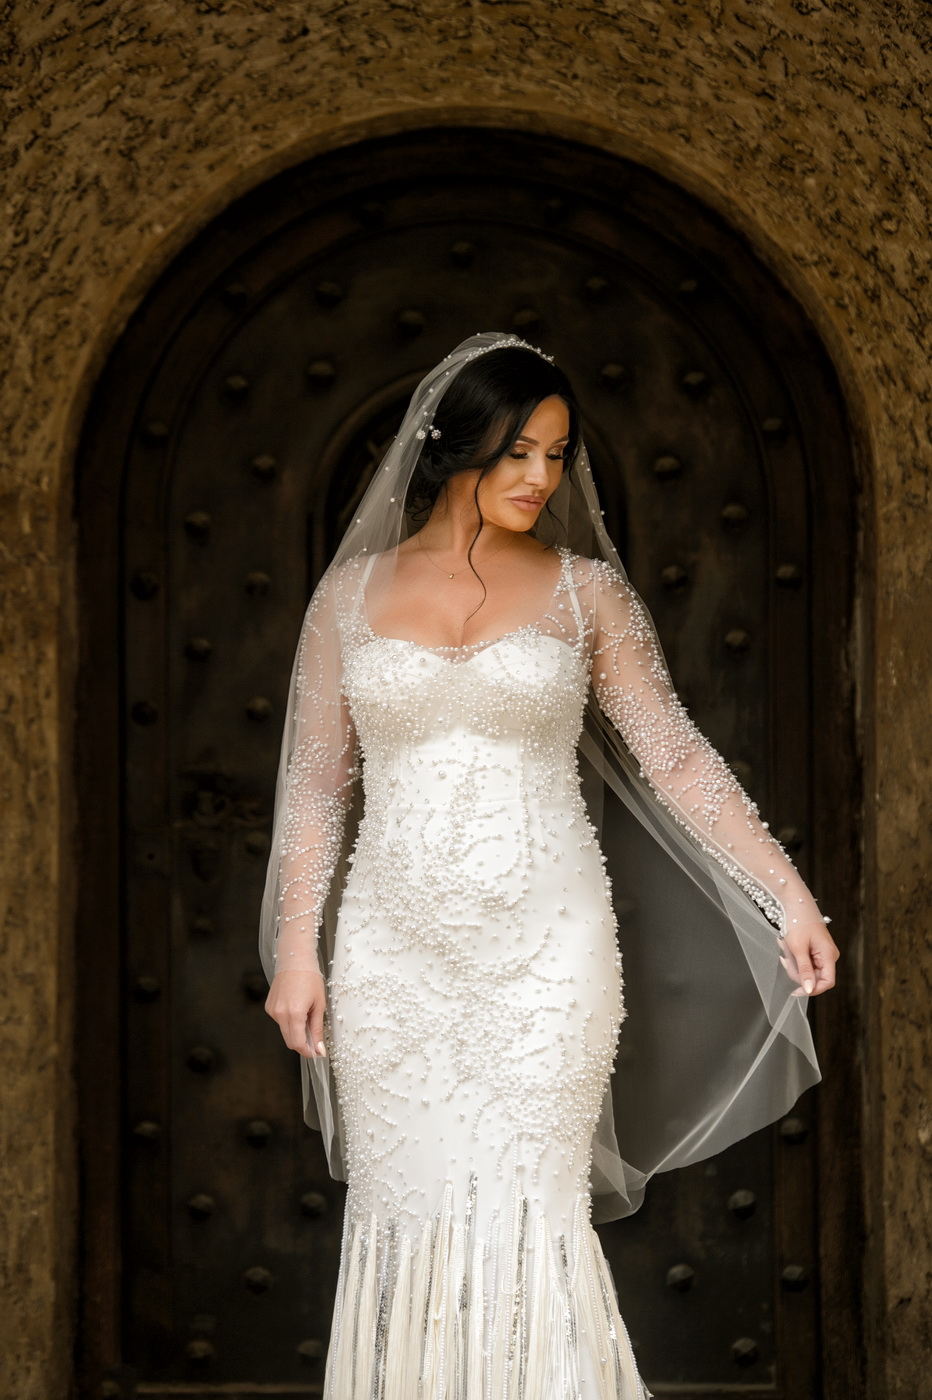 Destination Wedding Photographer_Marian Sterea_152.jpg